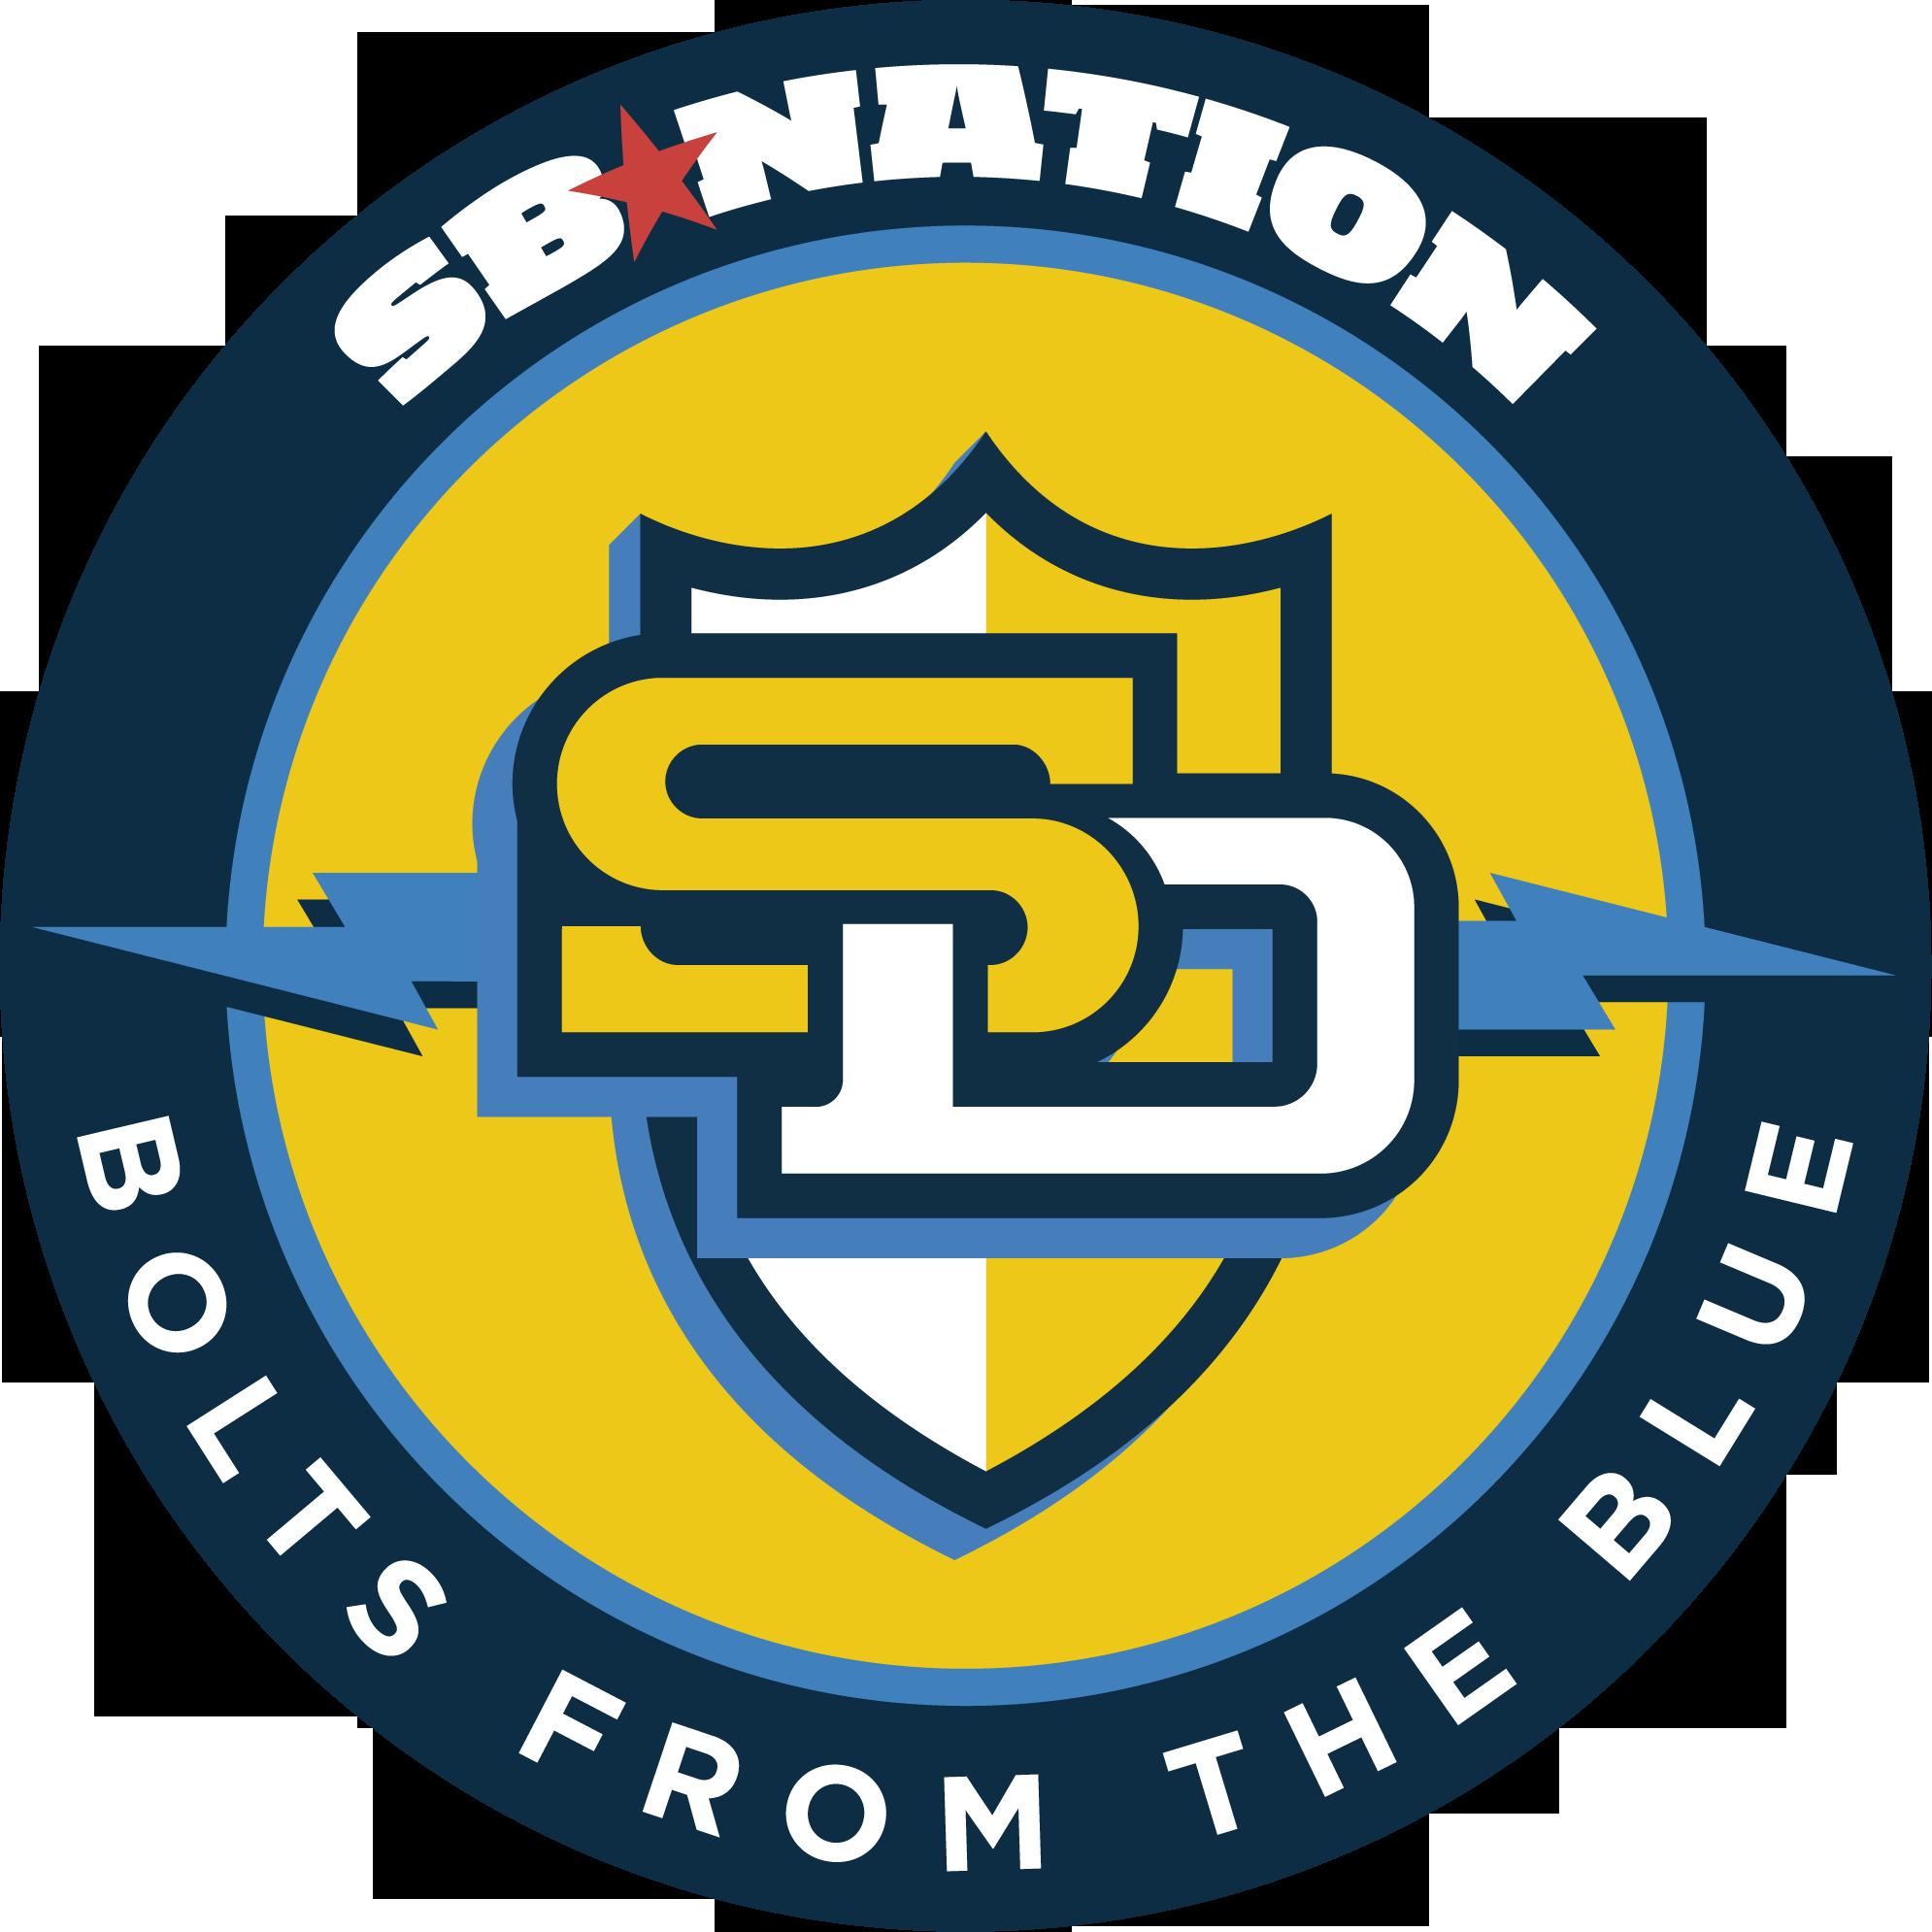 bftb logo